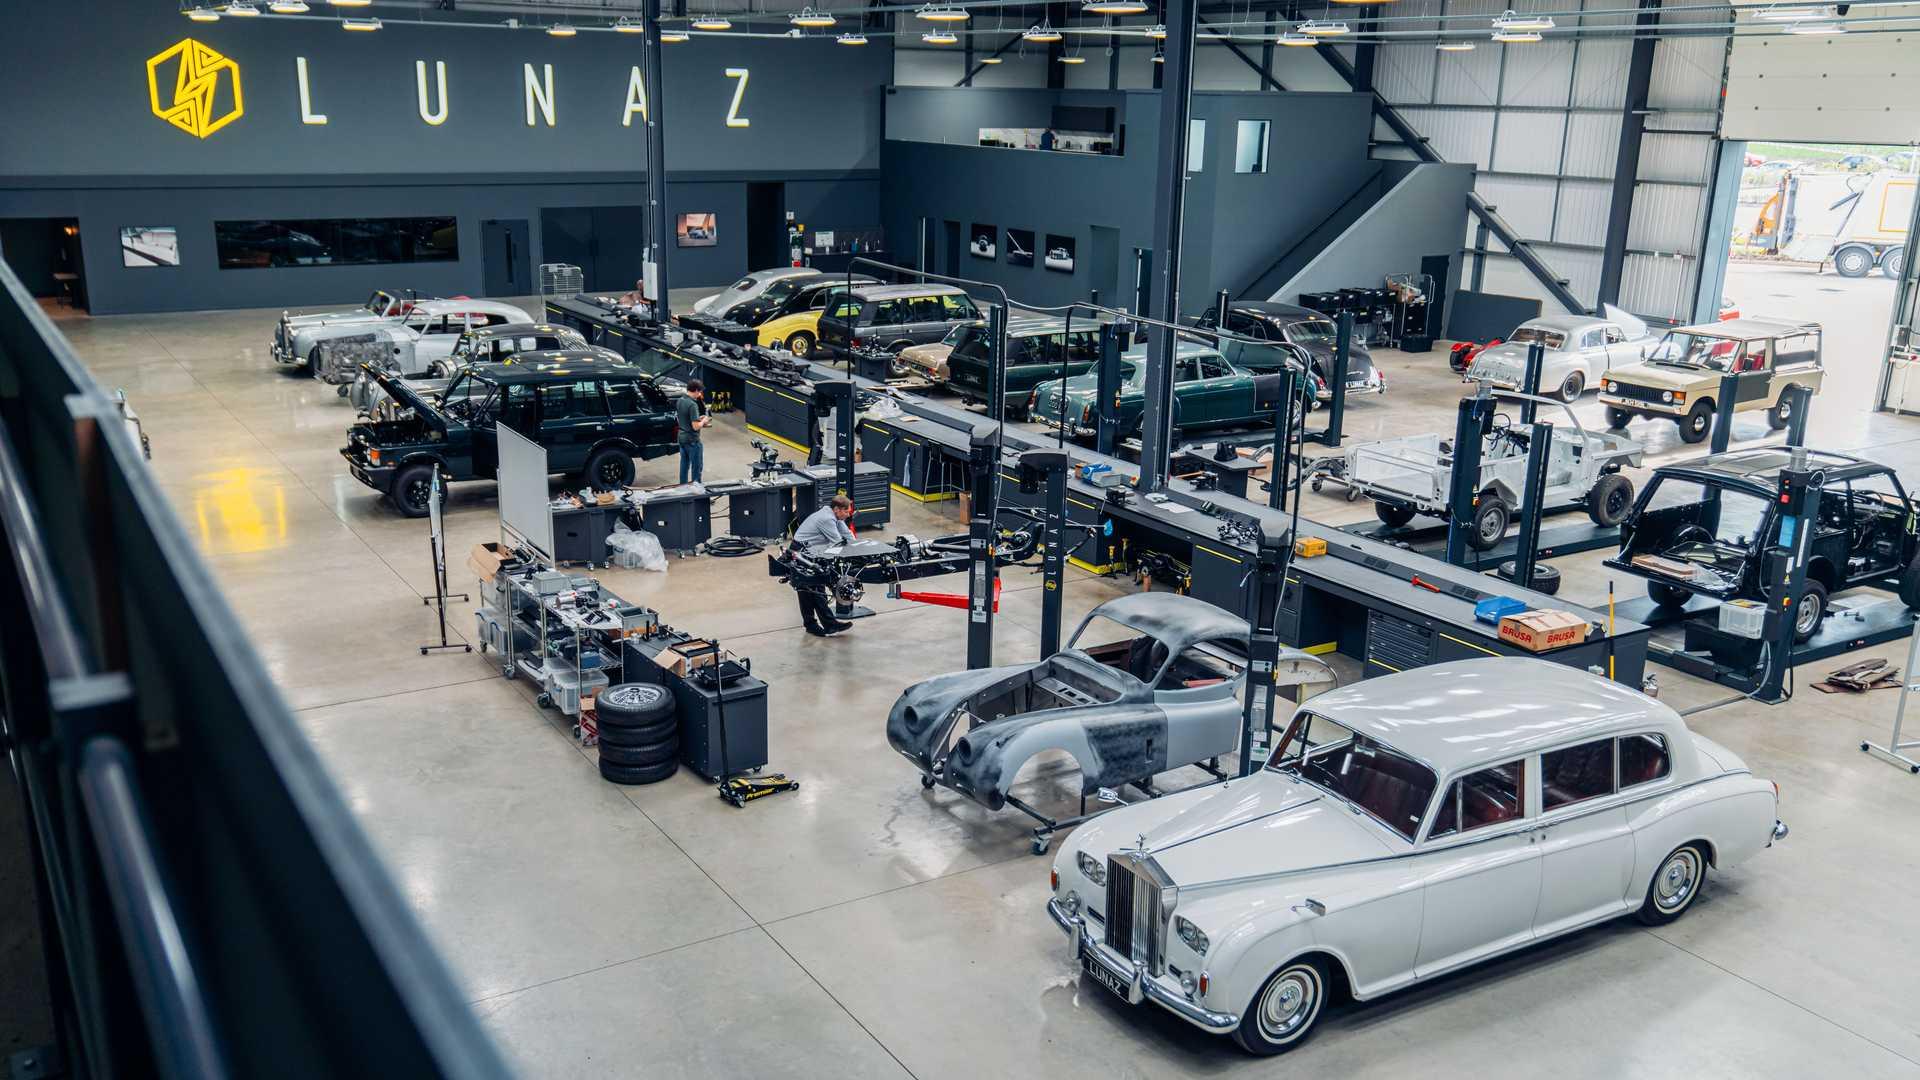 lunaz-factory.jpeg